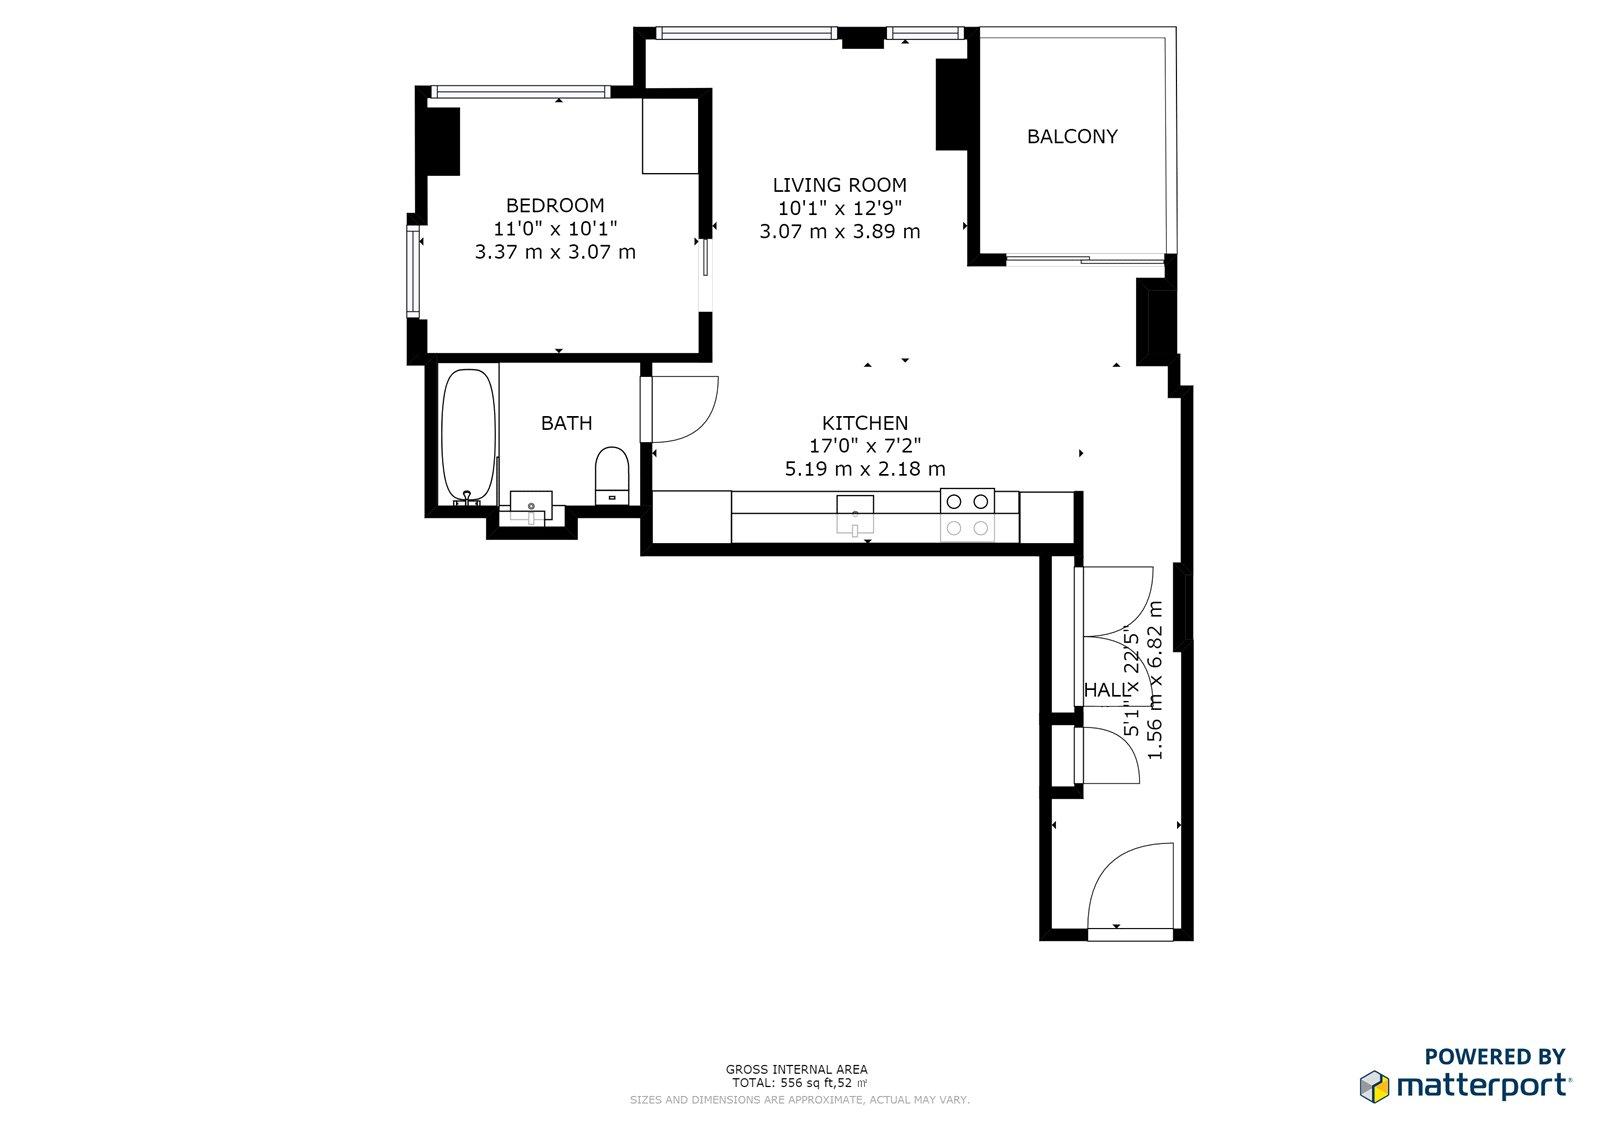 1 Bedroom Property To Let In Atlas Building City Road London Ec1v 2250 Pcm